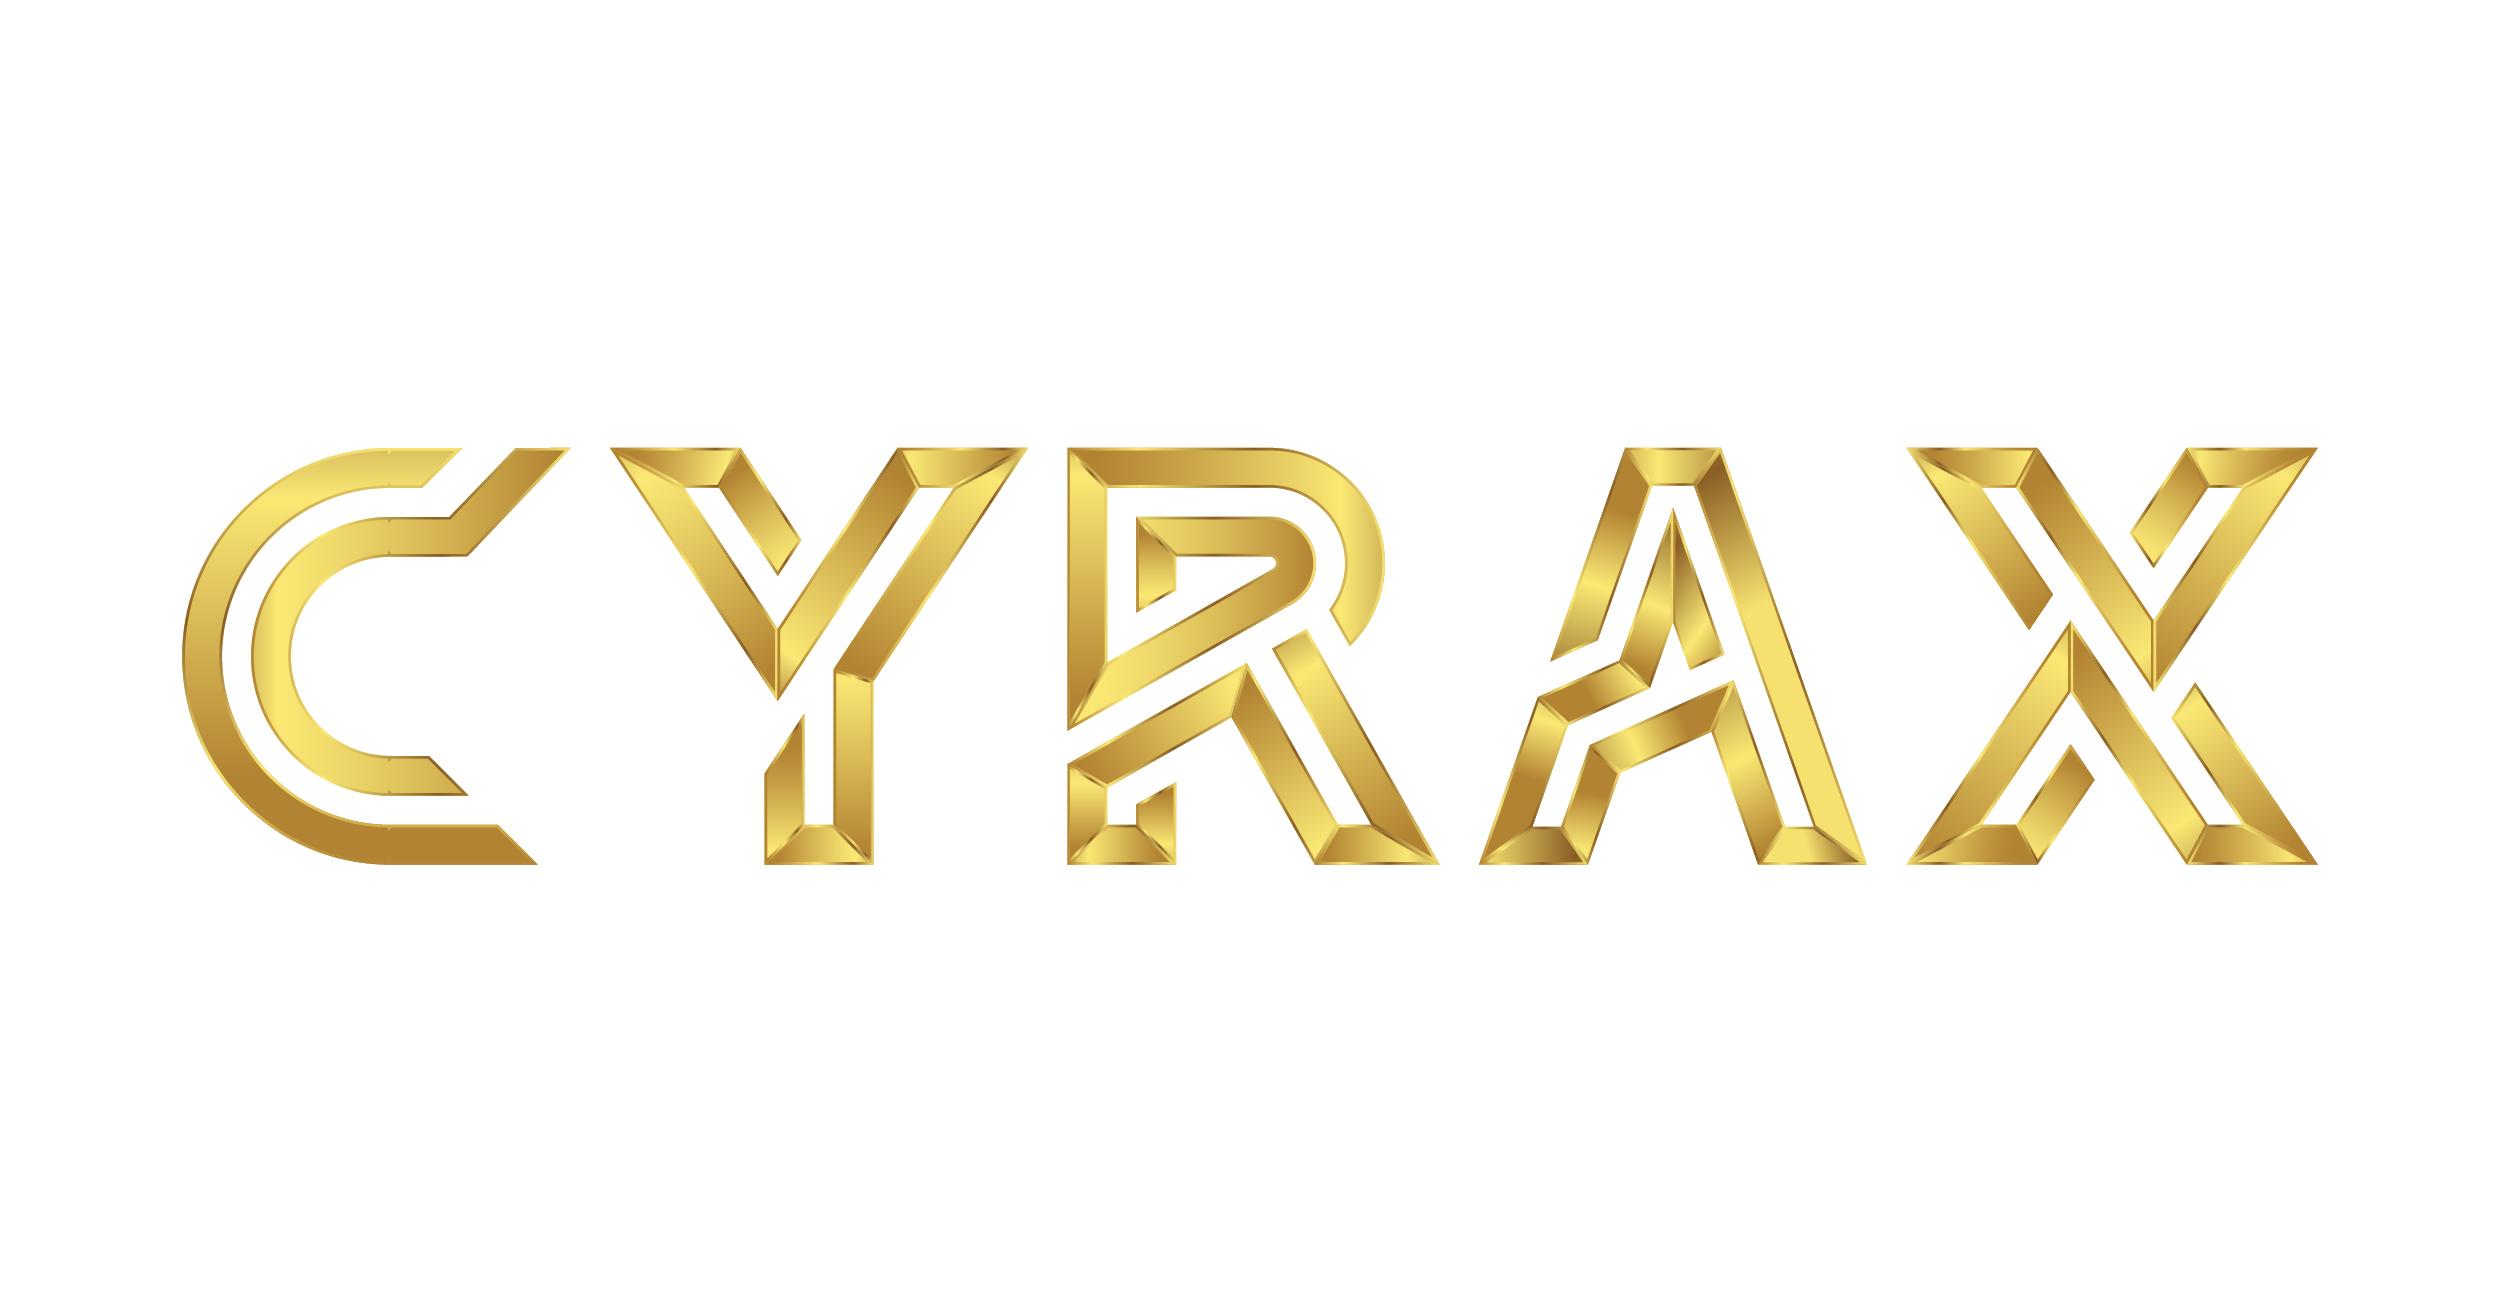 Proposta logo design Cyrax